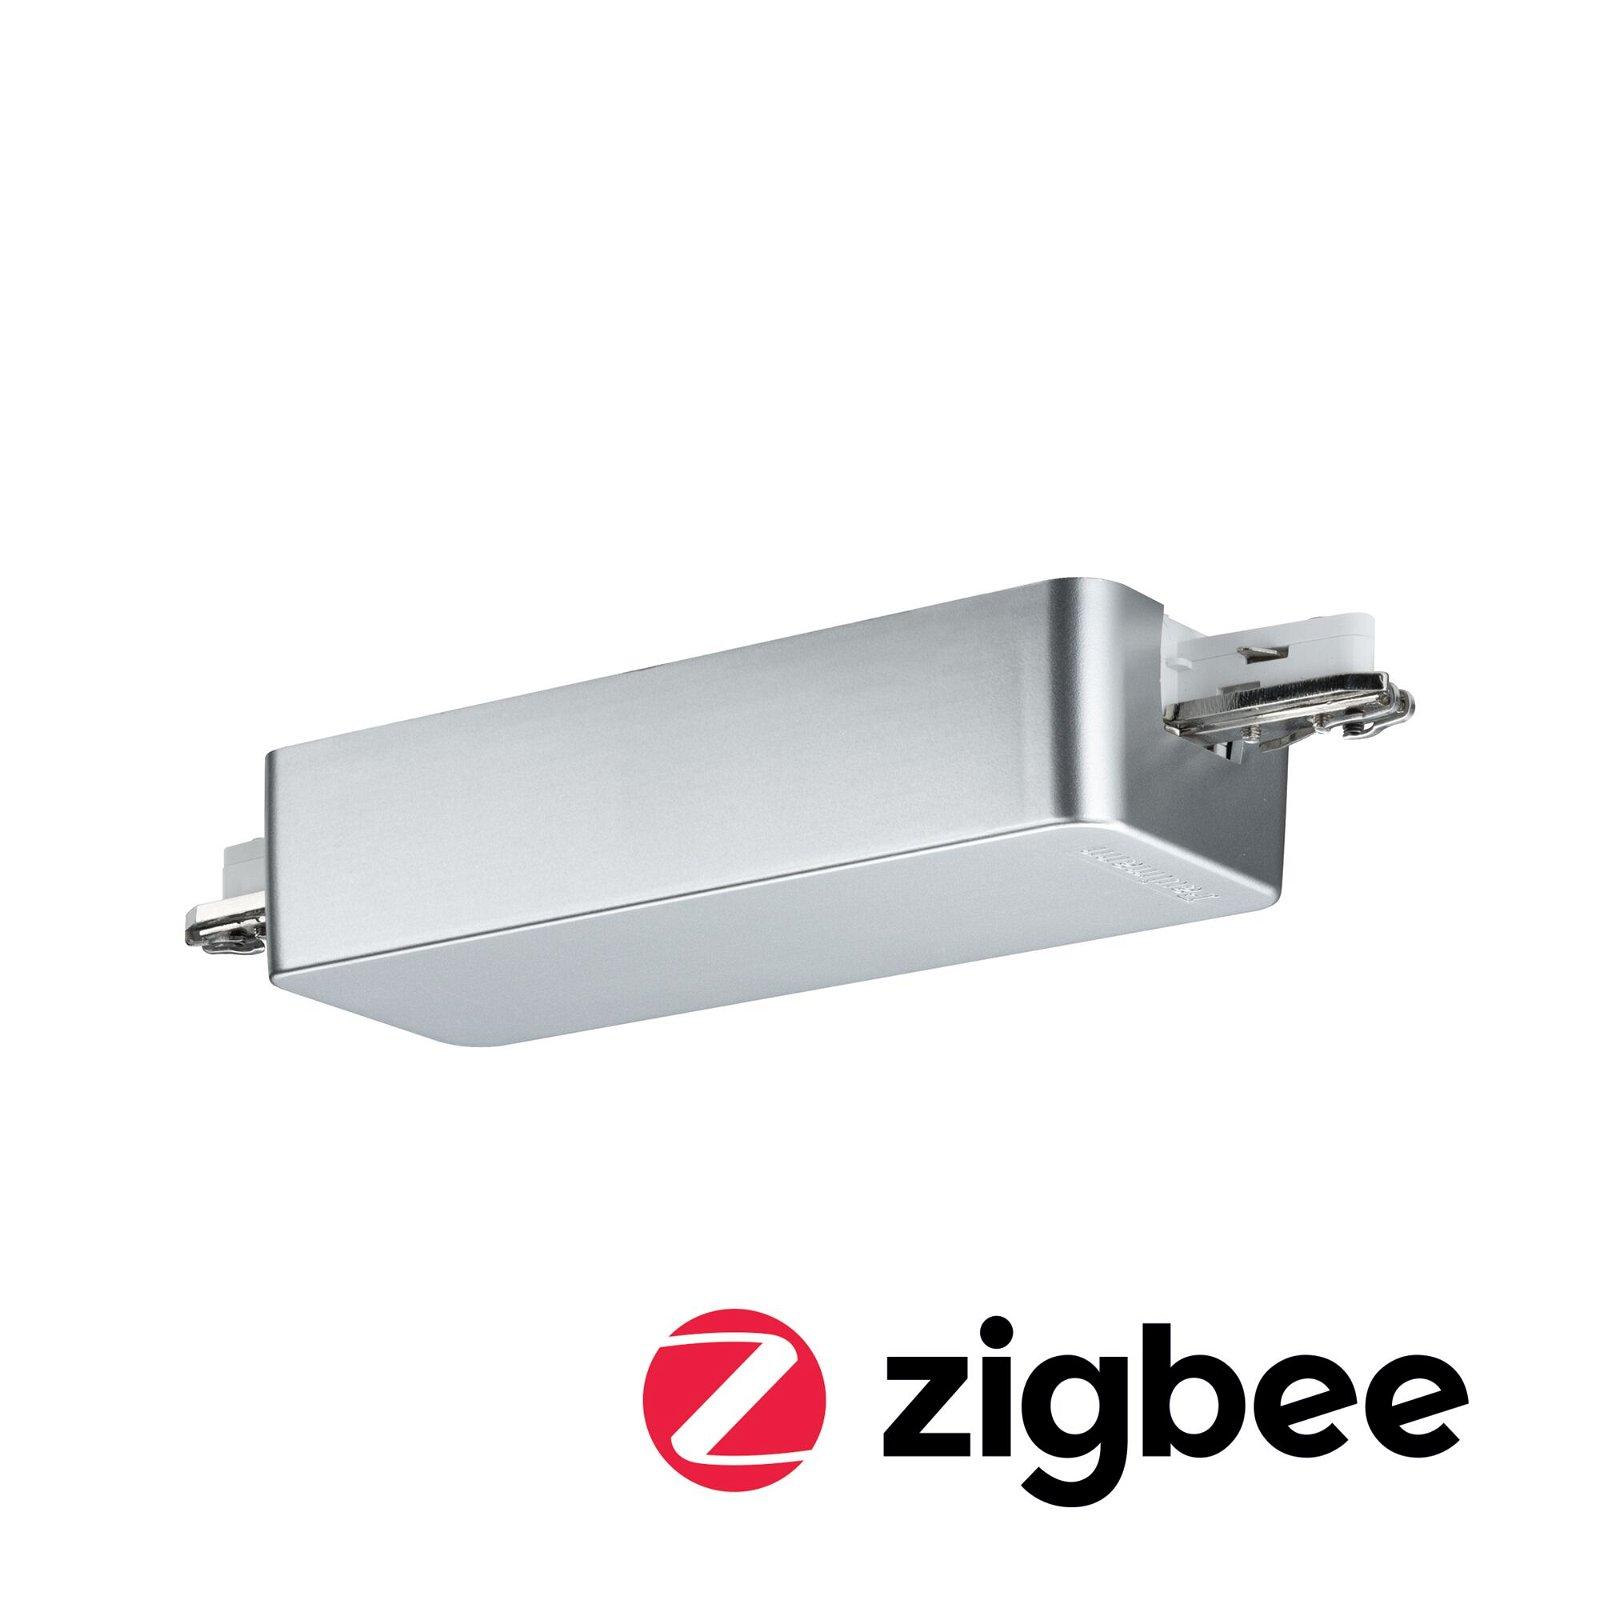 URail Adaptateur de rail Smart Home Zigbee Dimm/Switch 155x56mm Chrome mat